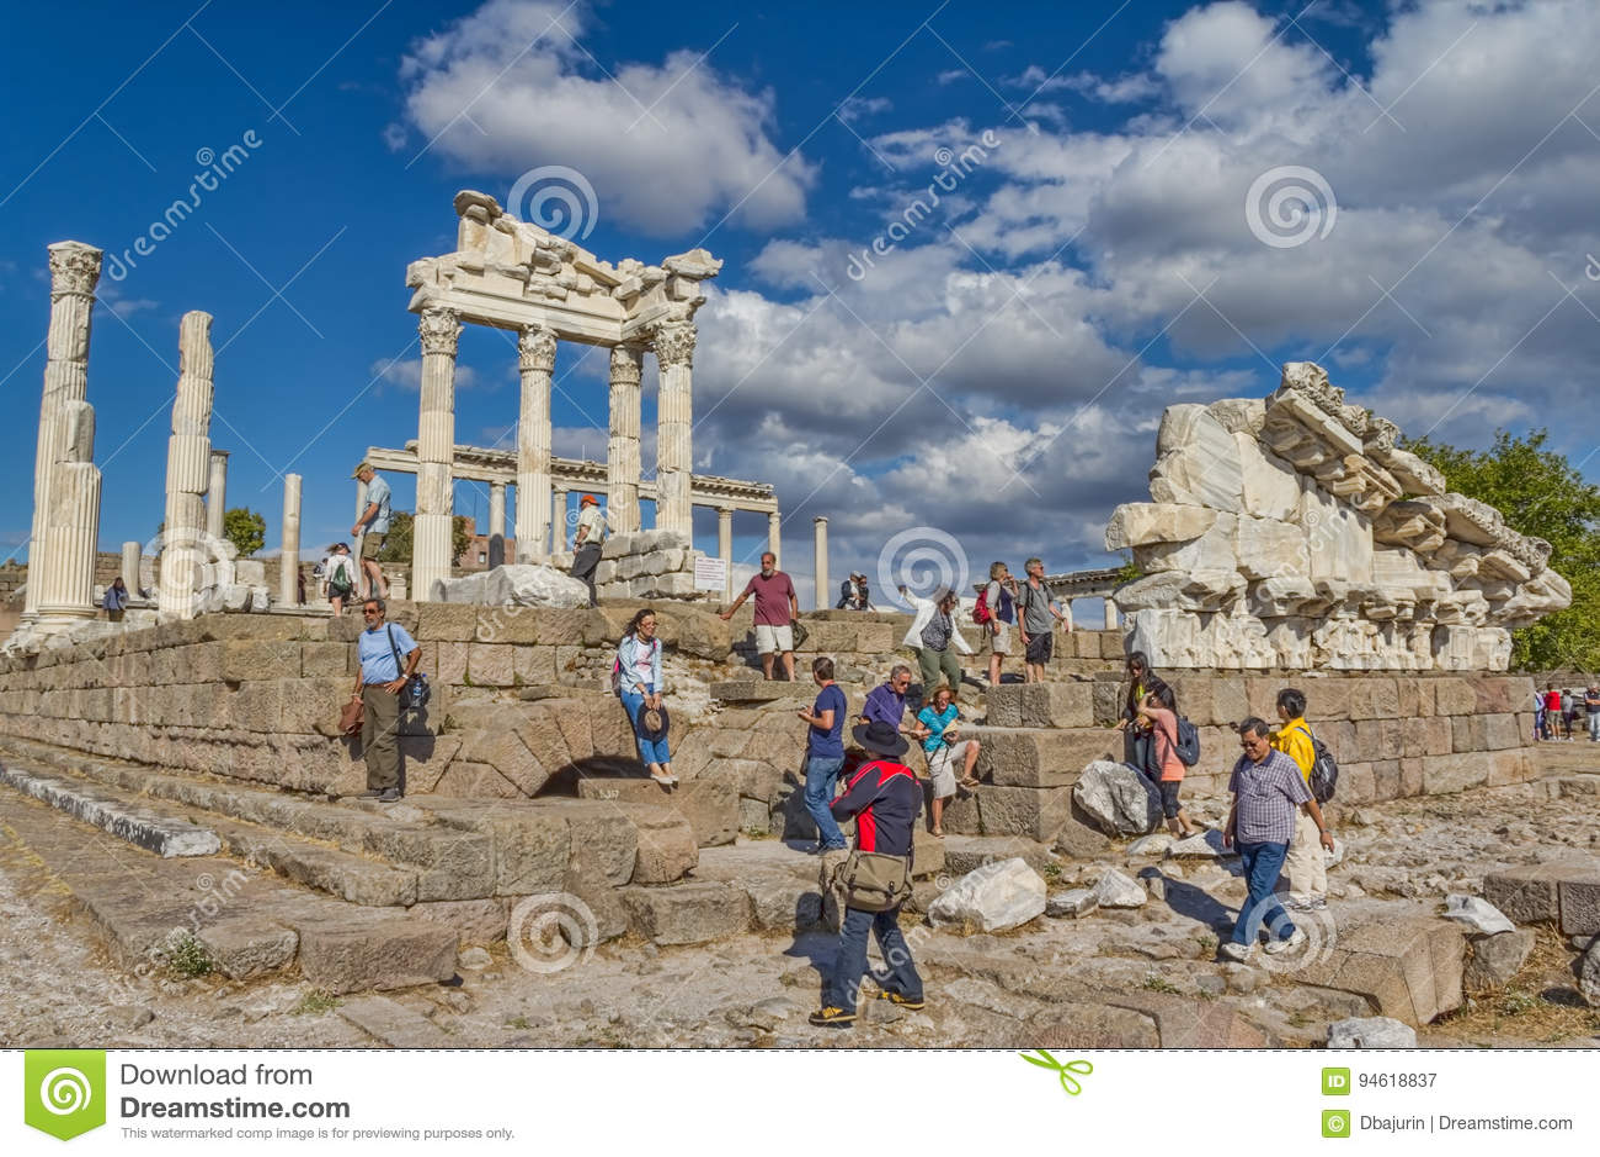 Pergamon - Temple of Trajan